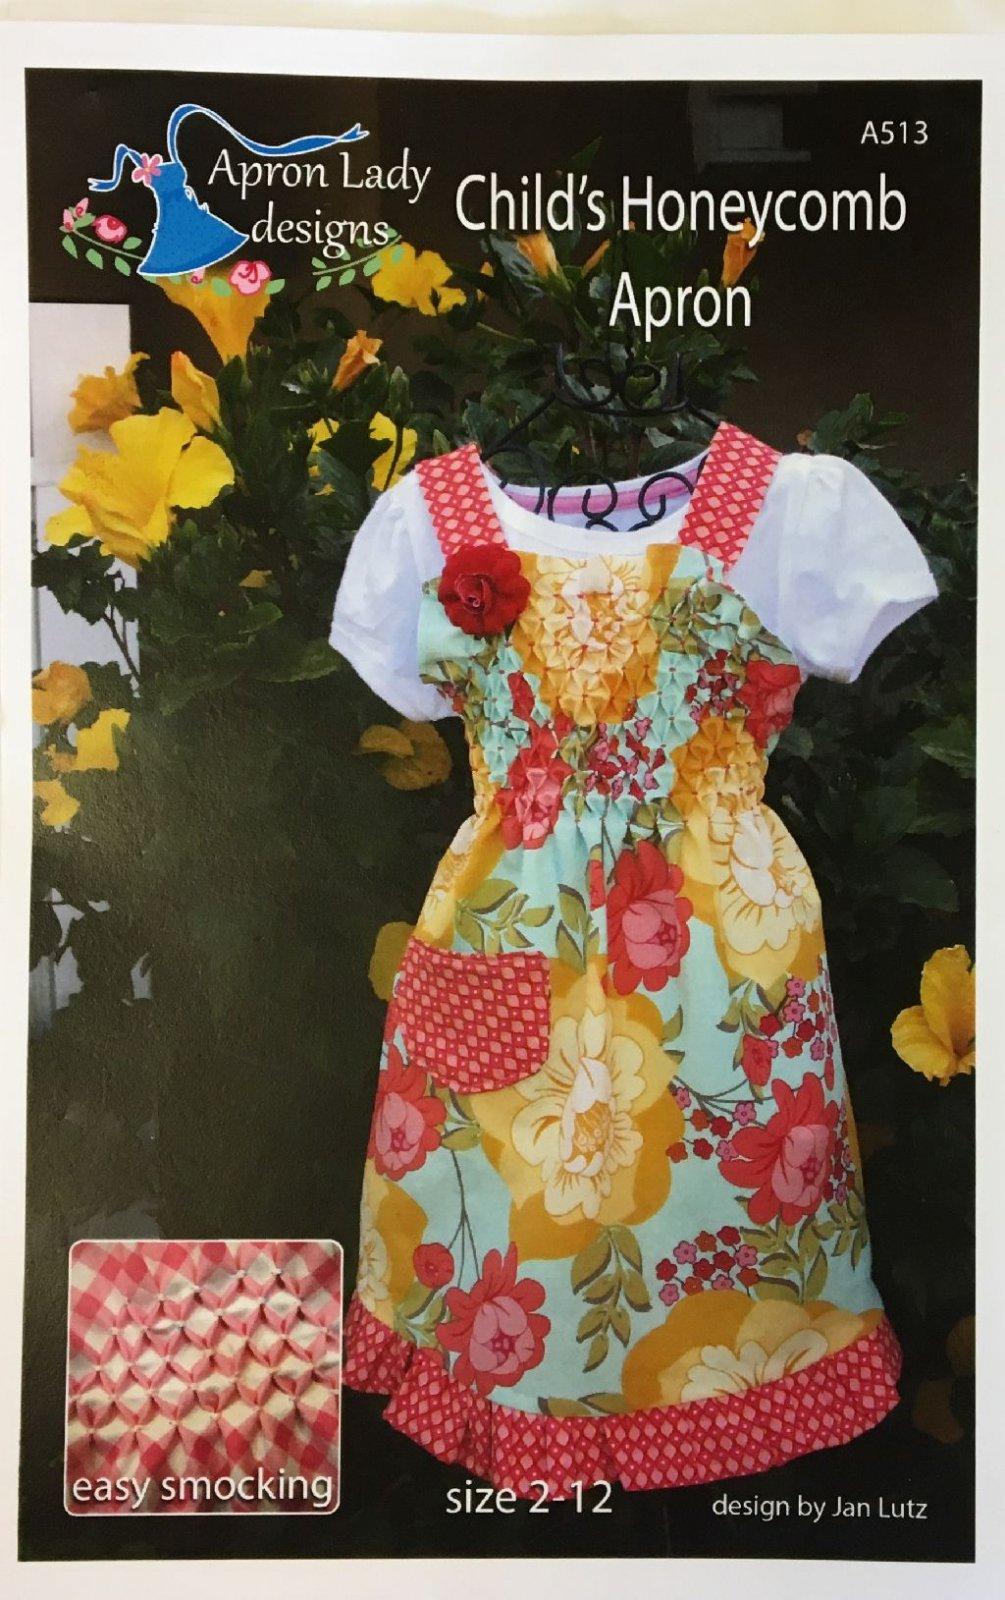 Child's Honeycomb  Apron